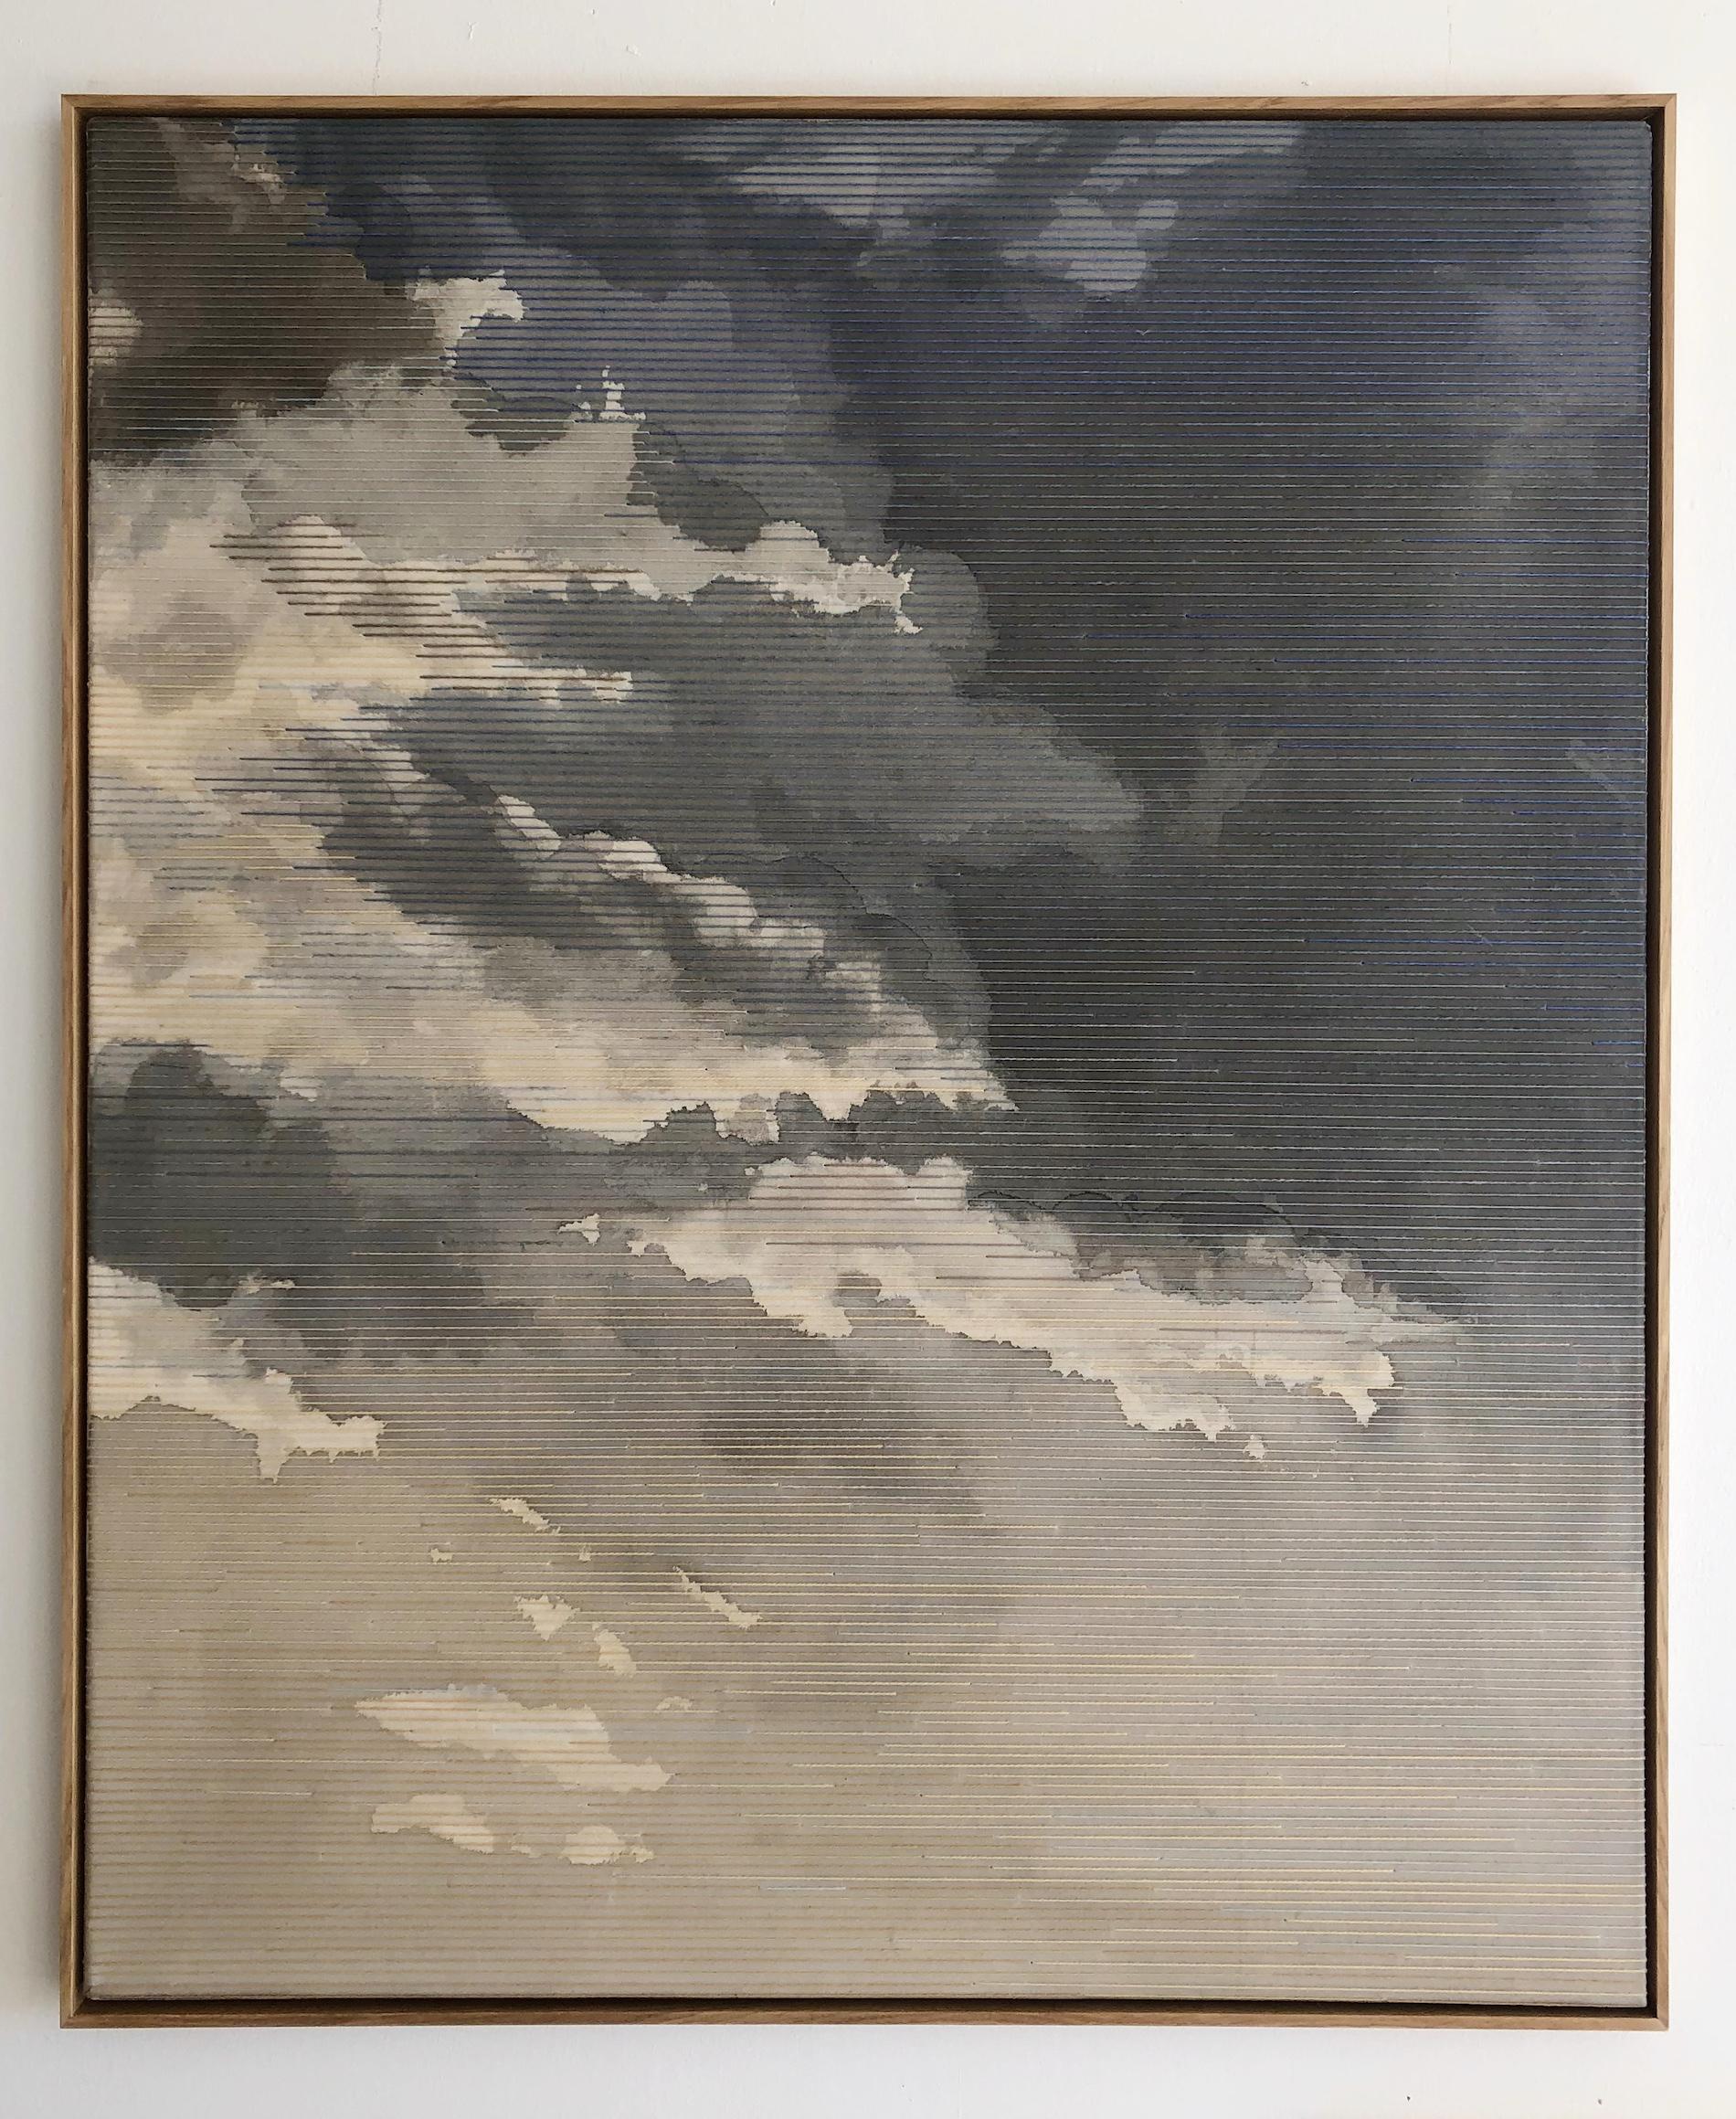 Linda Männel: Fernweh II, 2020, Tusche/Garn auf Leinwand, 100 x 130 cm